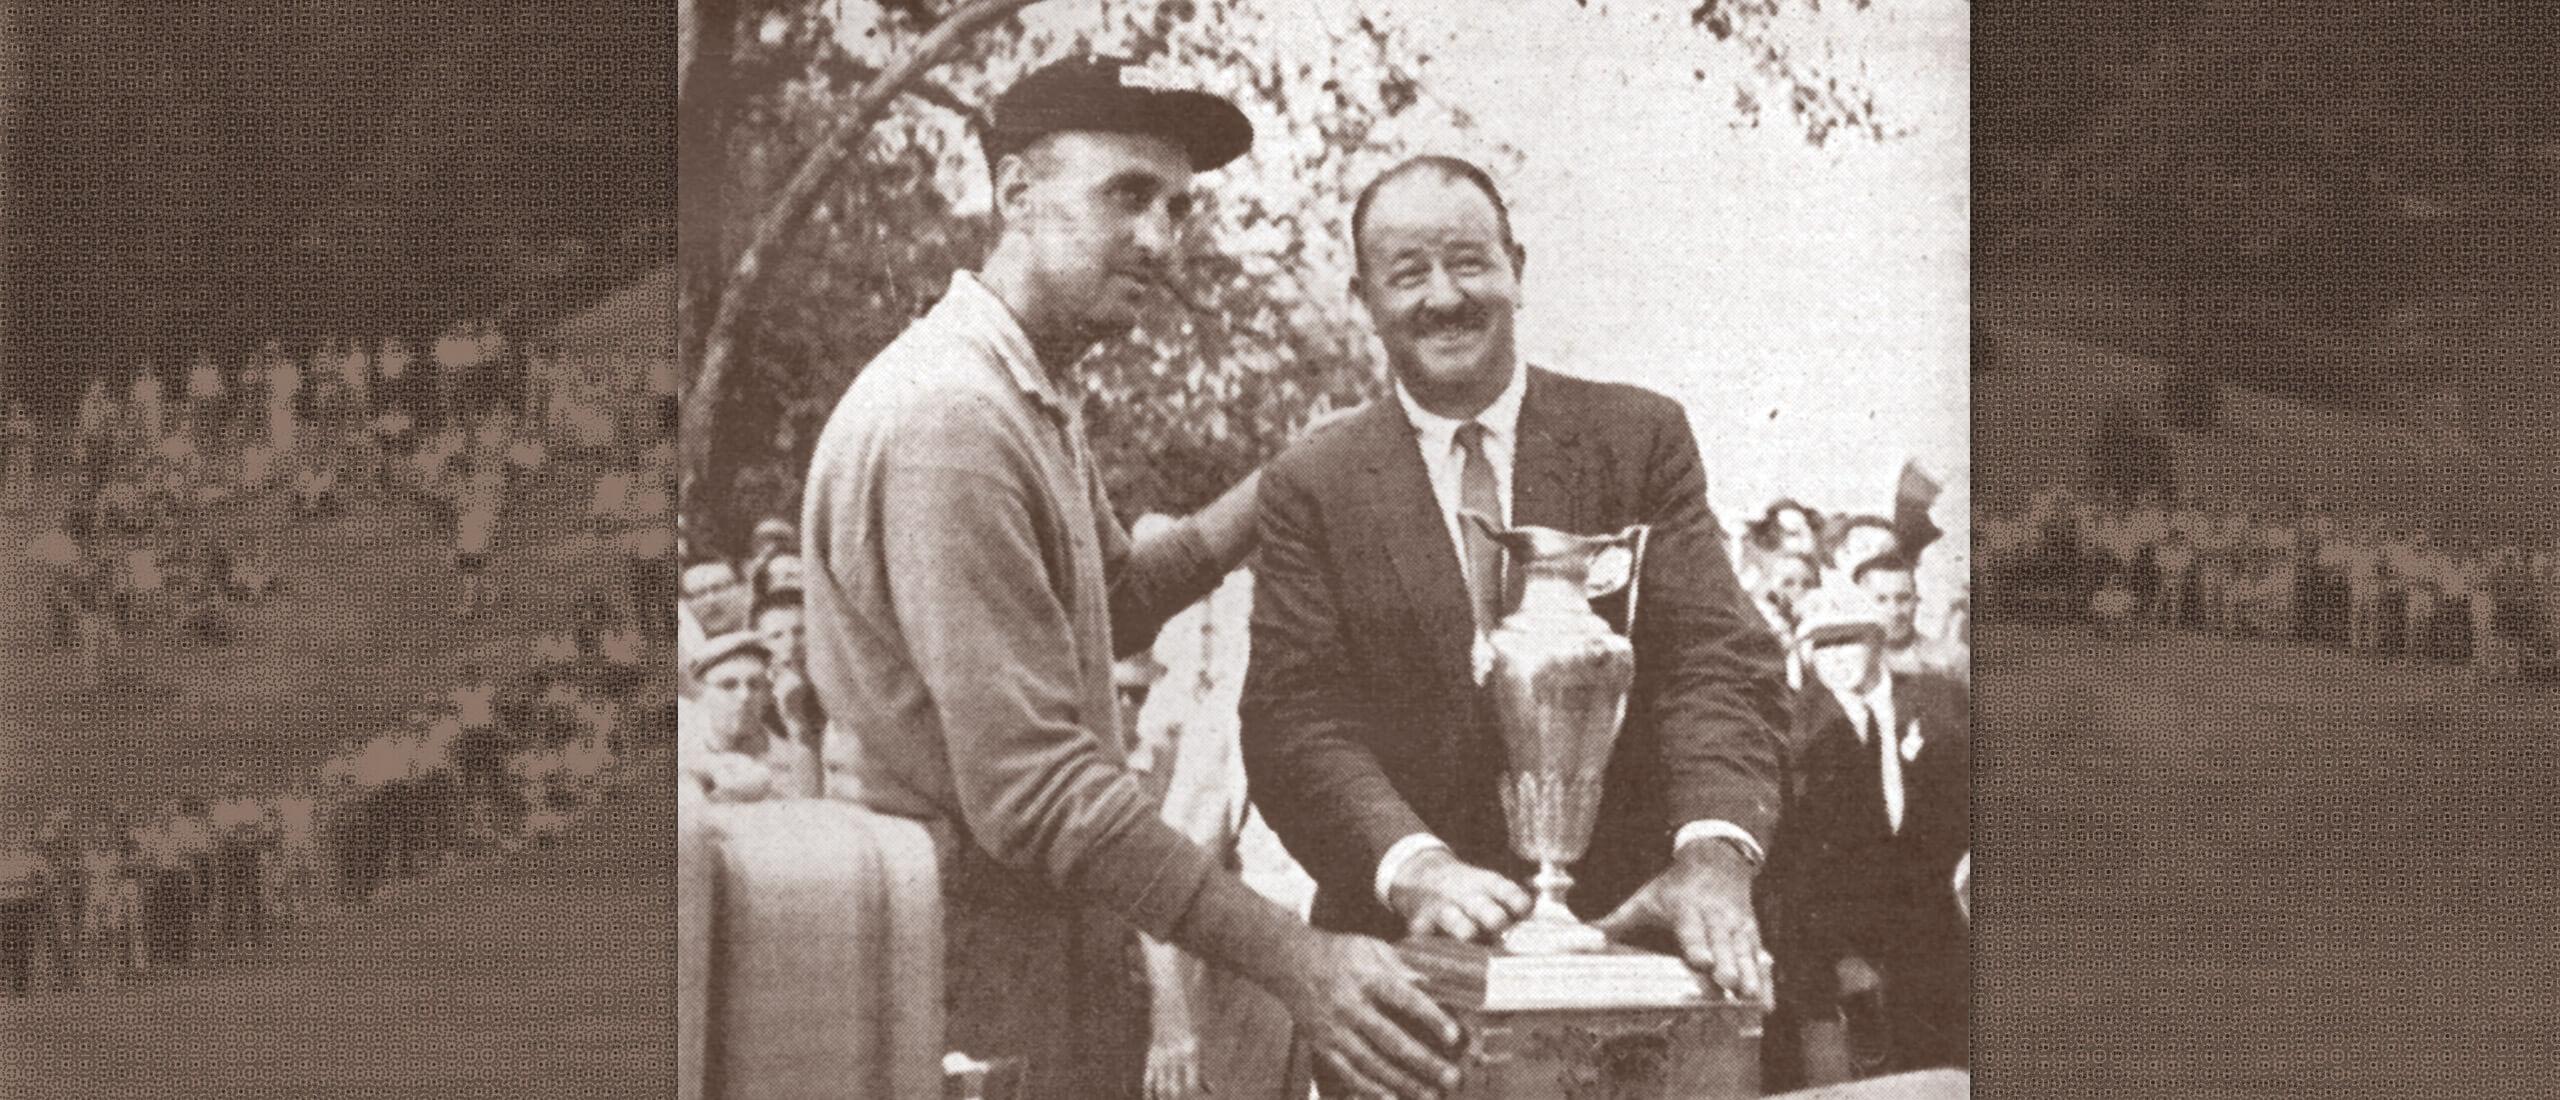 1960 – 51st Canadian Open Champion, Art Wall Jr.